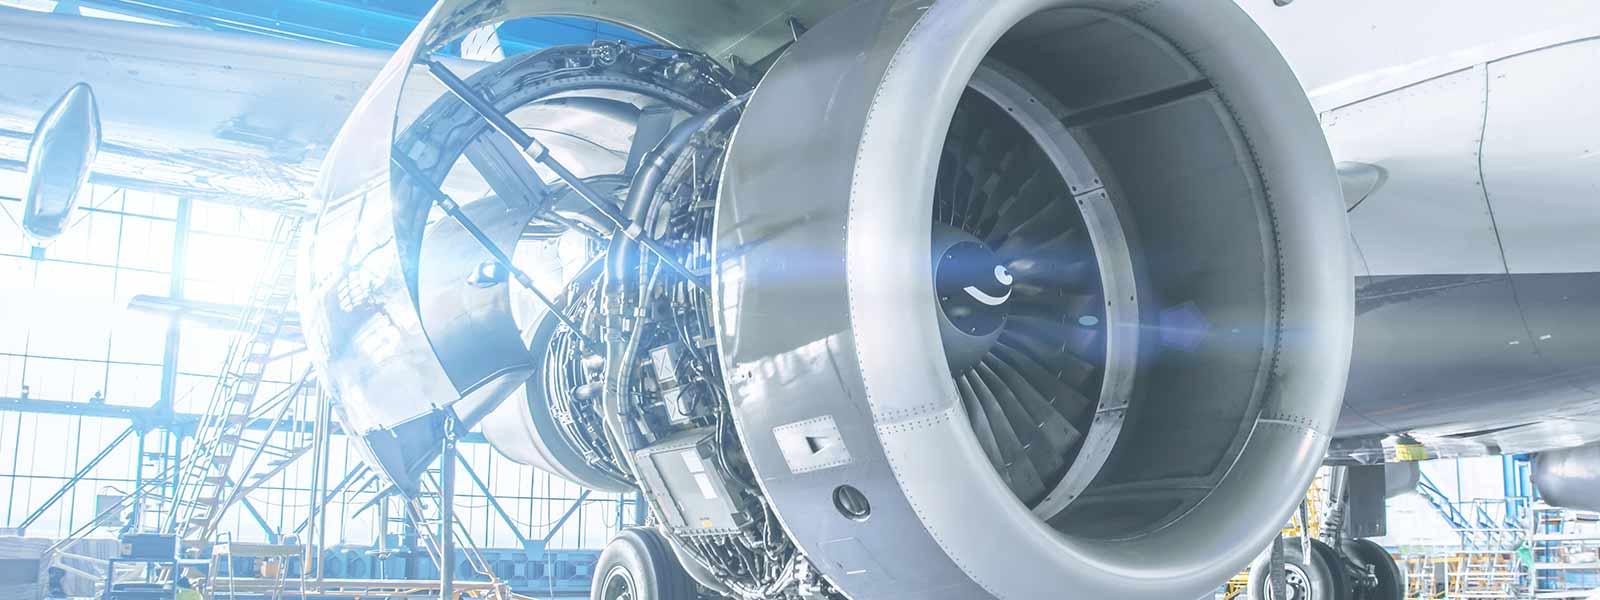 Aerospace 3D Printer